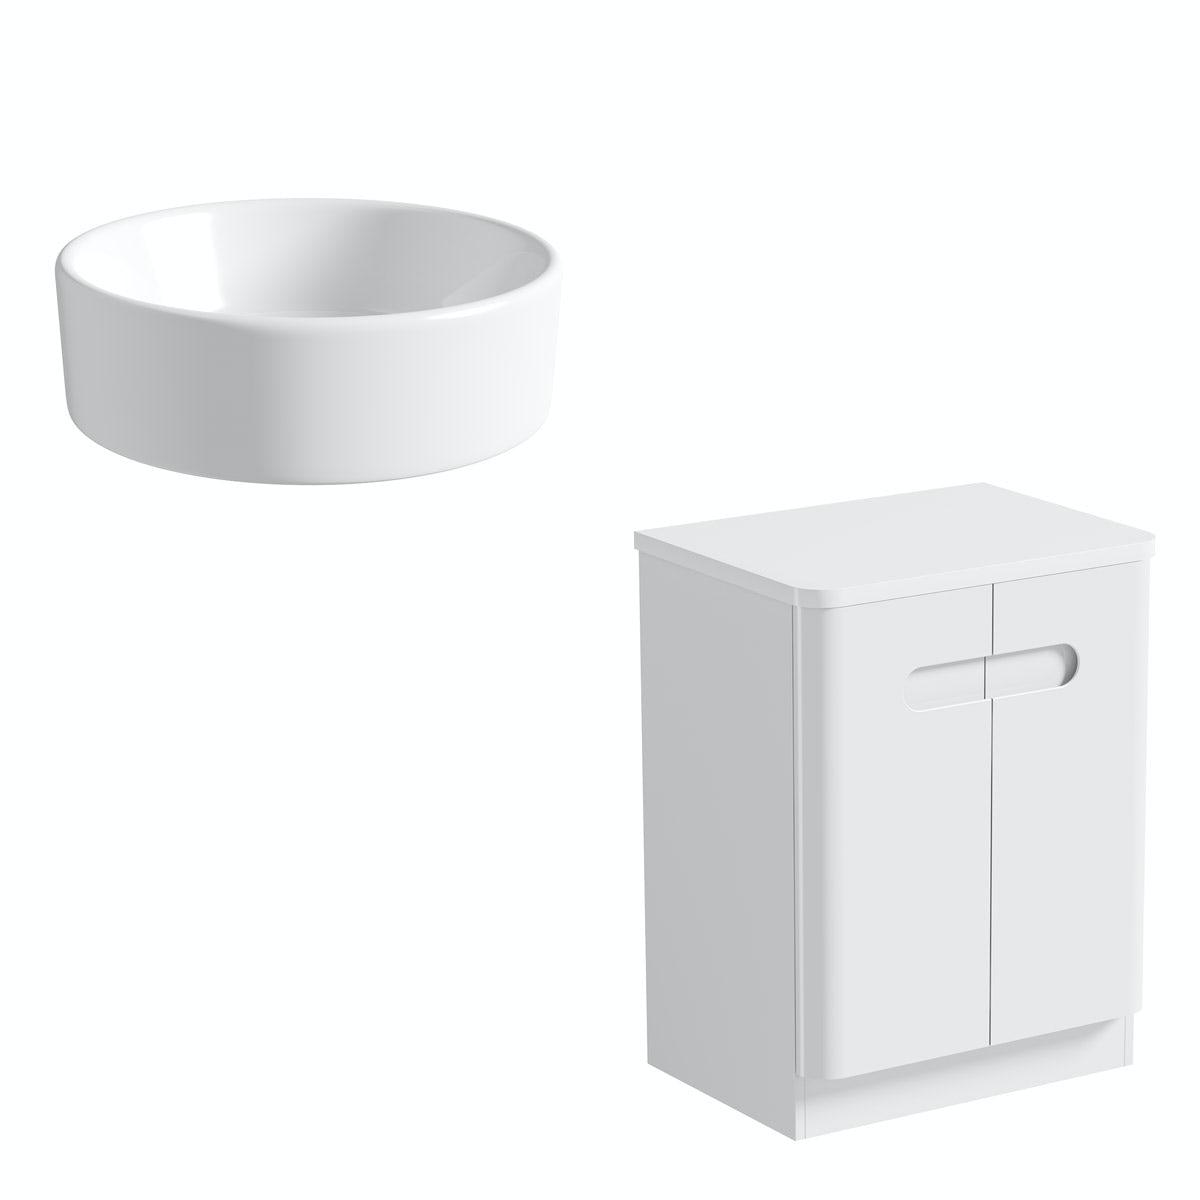 Mode Ellis white countertop door unit 600mm with Calhoun basin